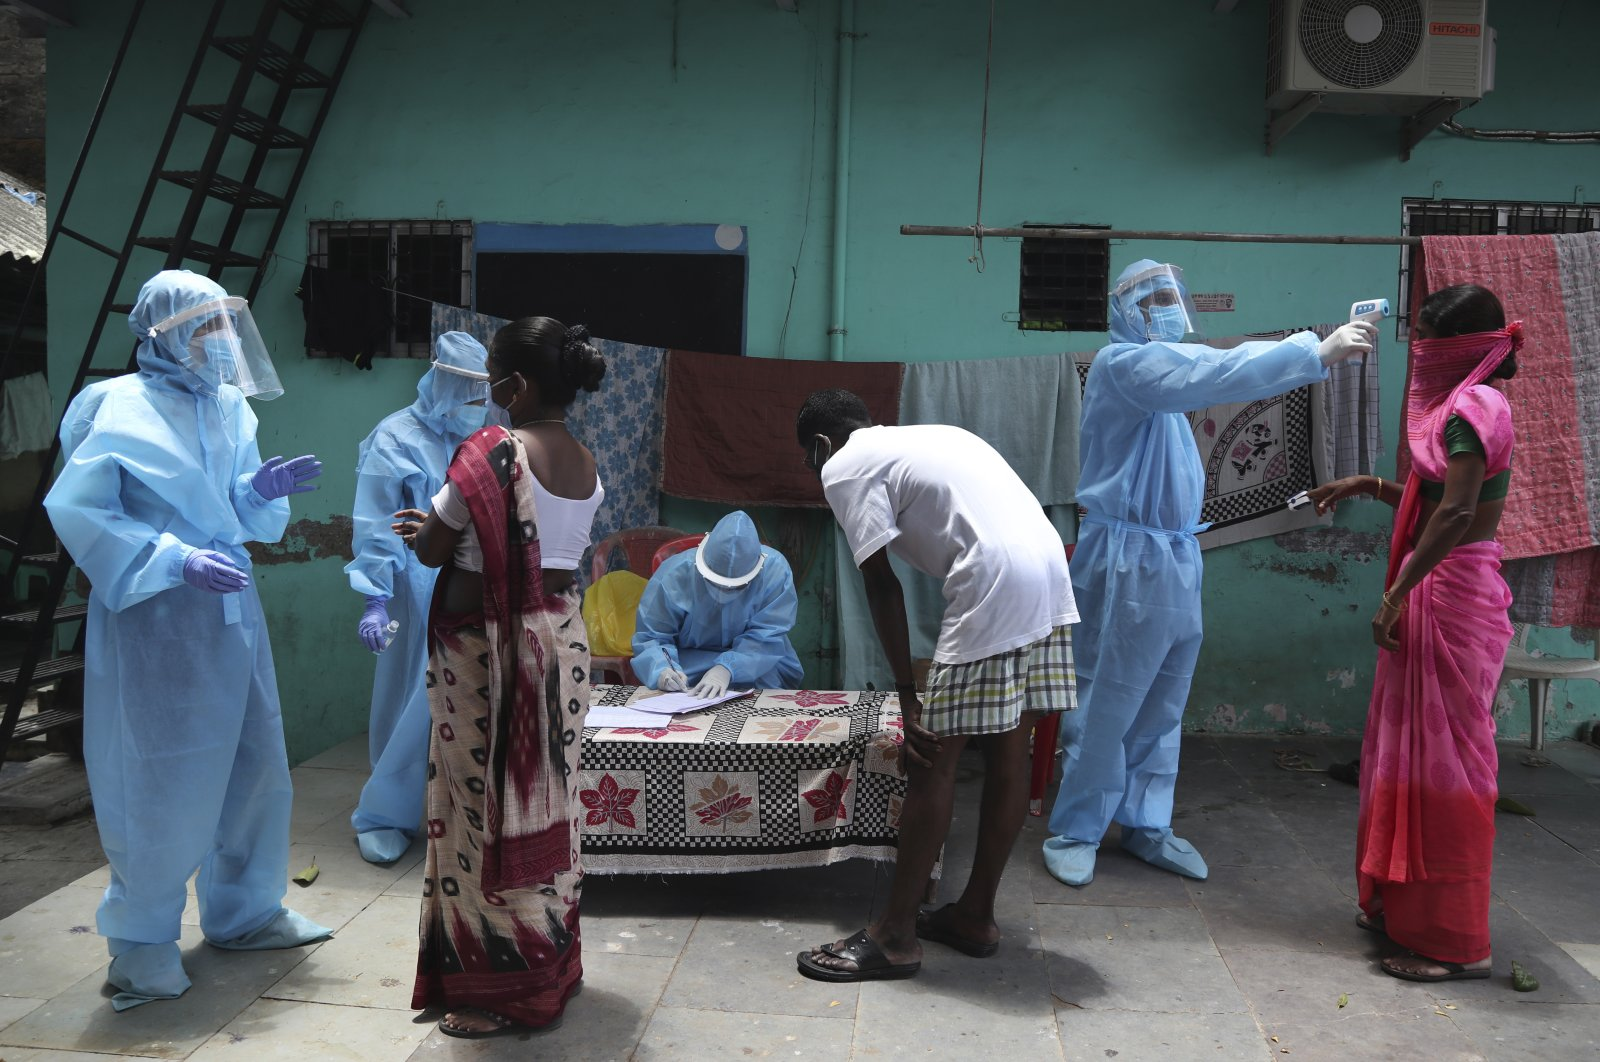 Doctors examine people during a free medical camp, Dharavi, Mumbai, India, June 7, 2020. (AP Photo)